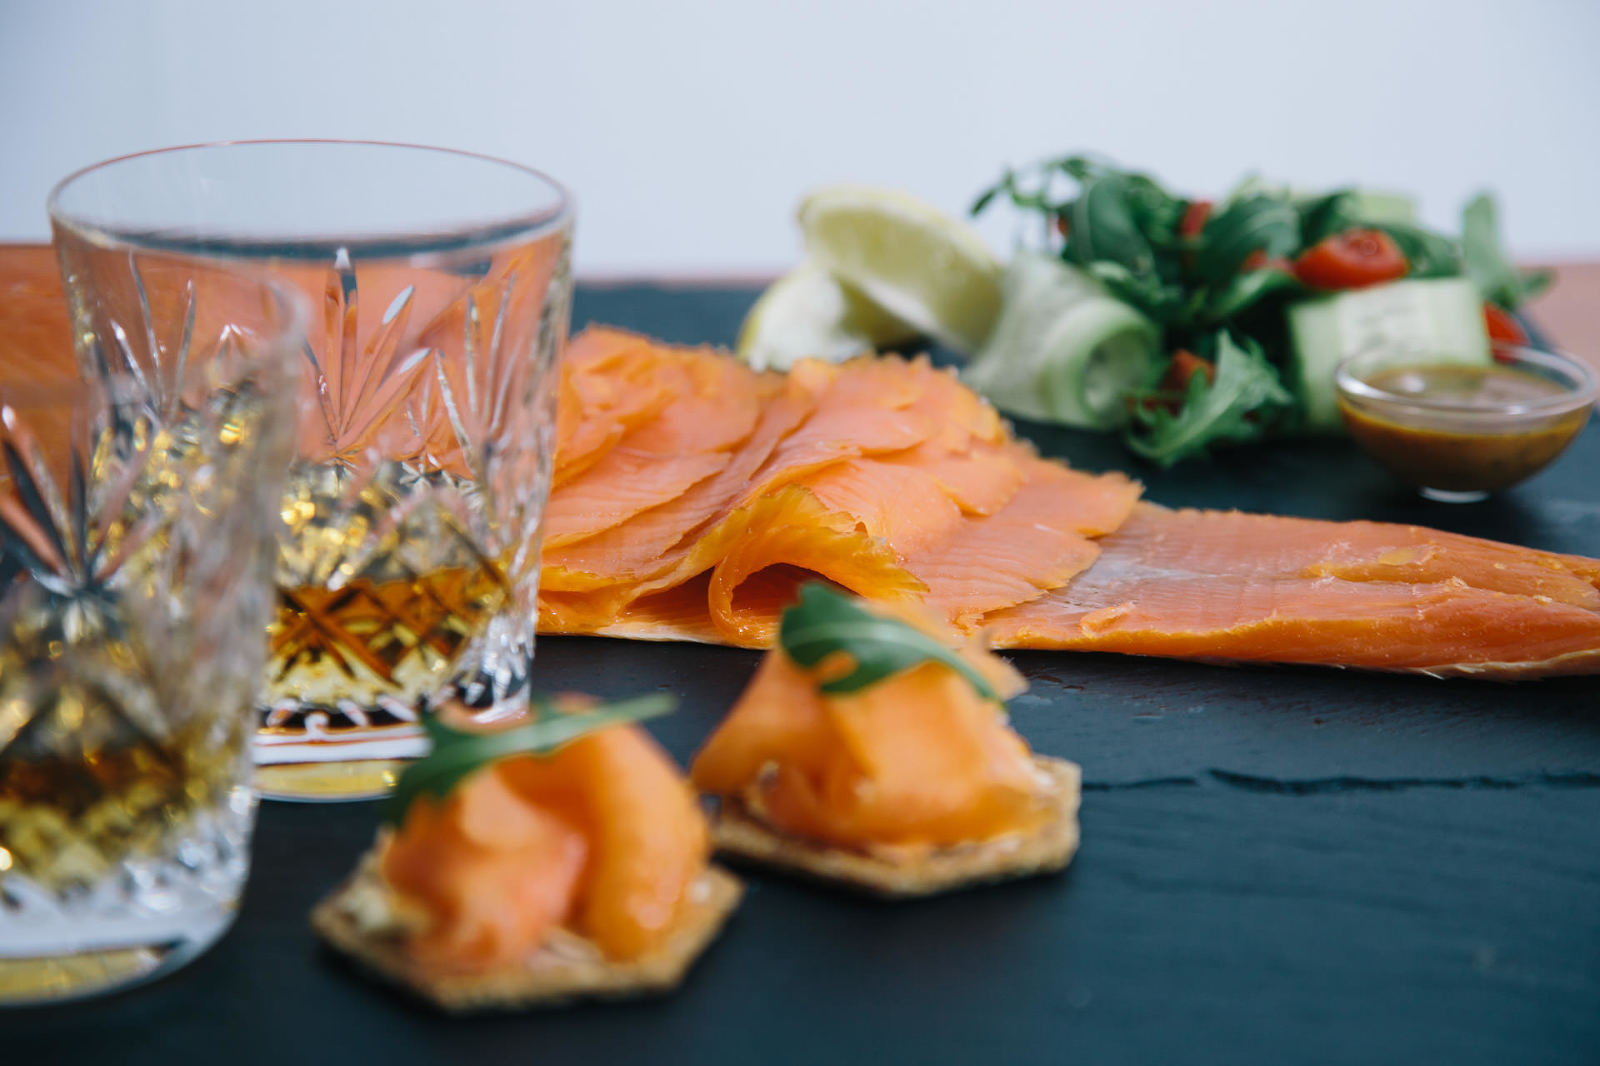 whisky-cold-smoked-salmon-salad-oatcakes